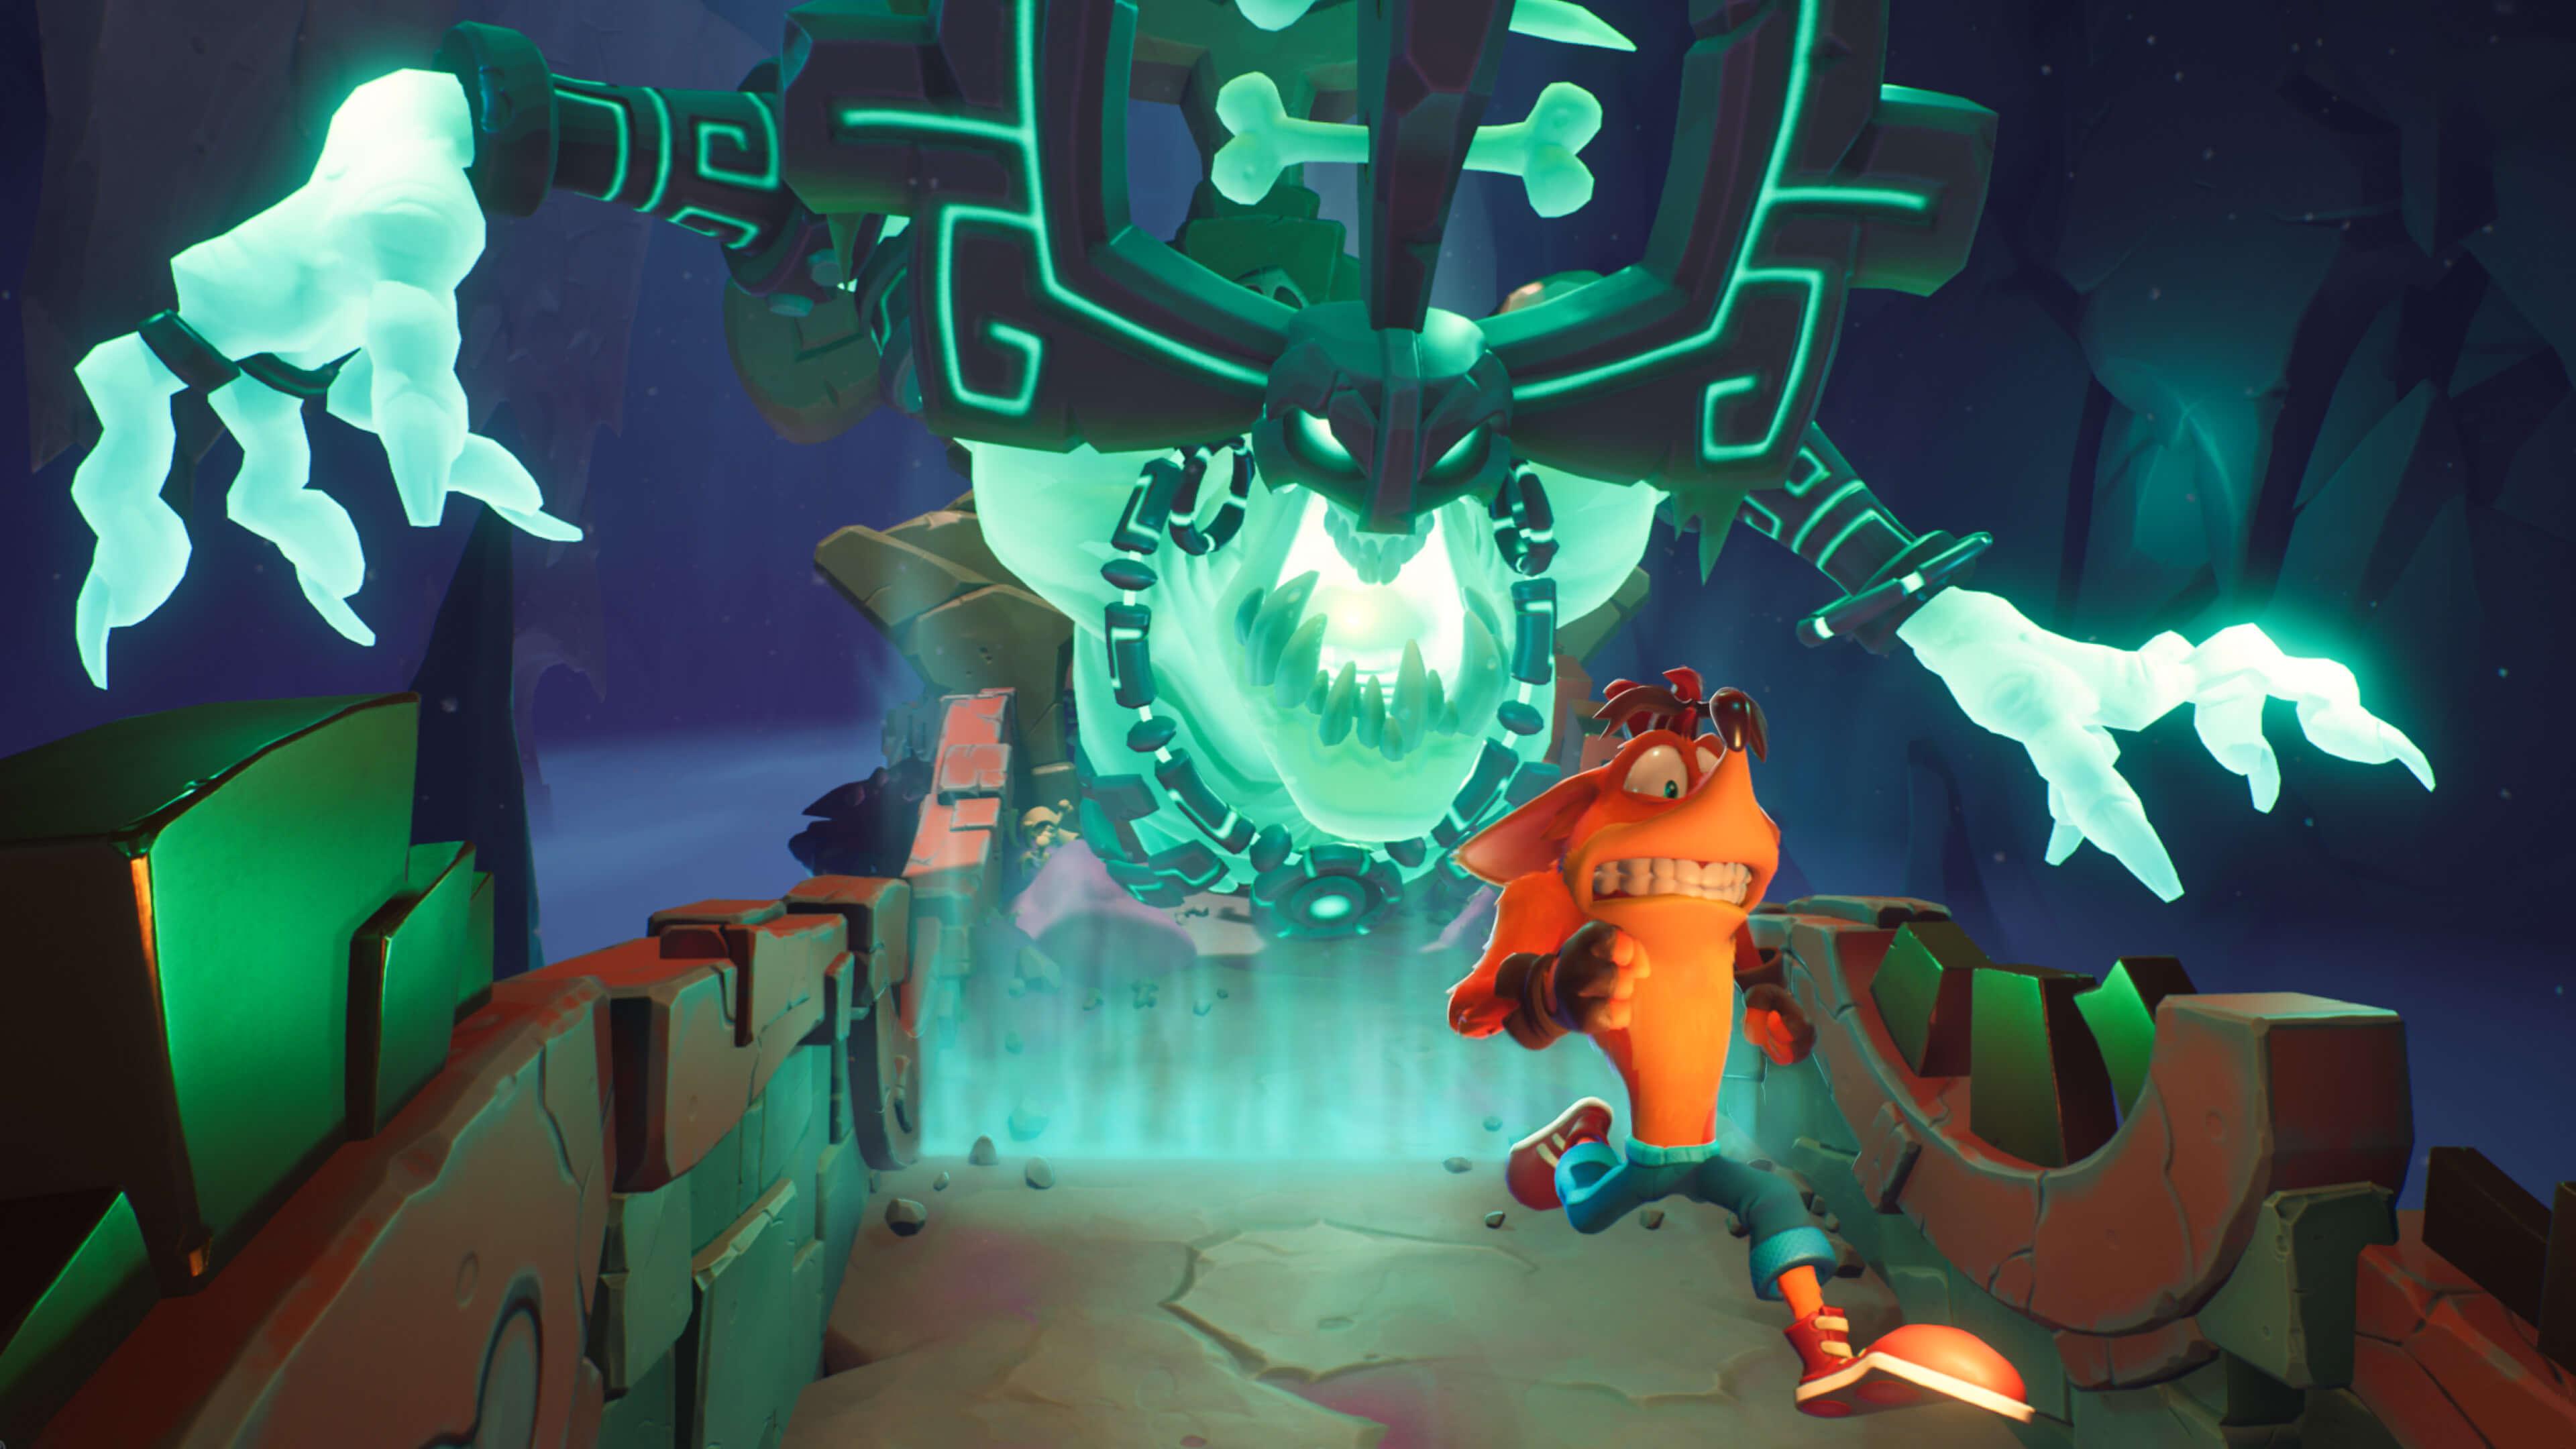 Best Ps4 games of 2020 - Crash 4